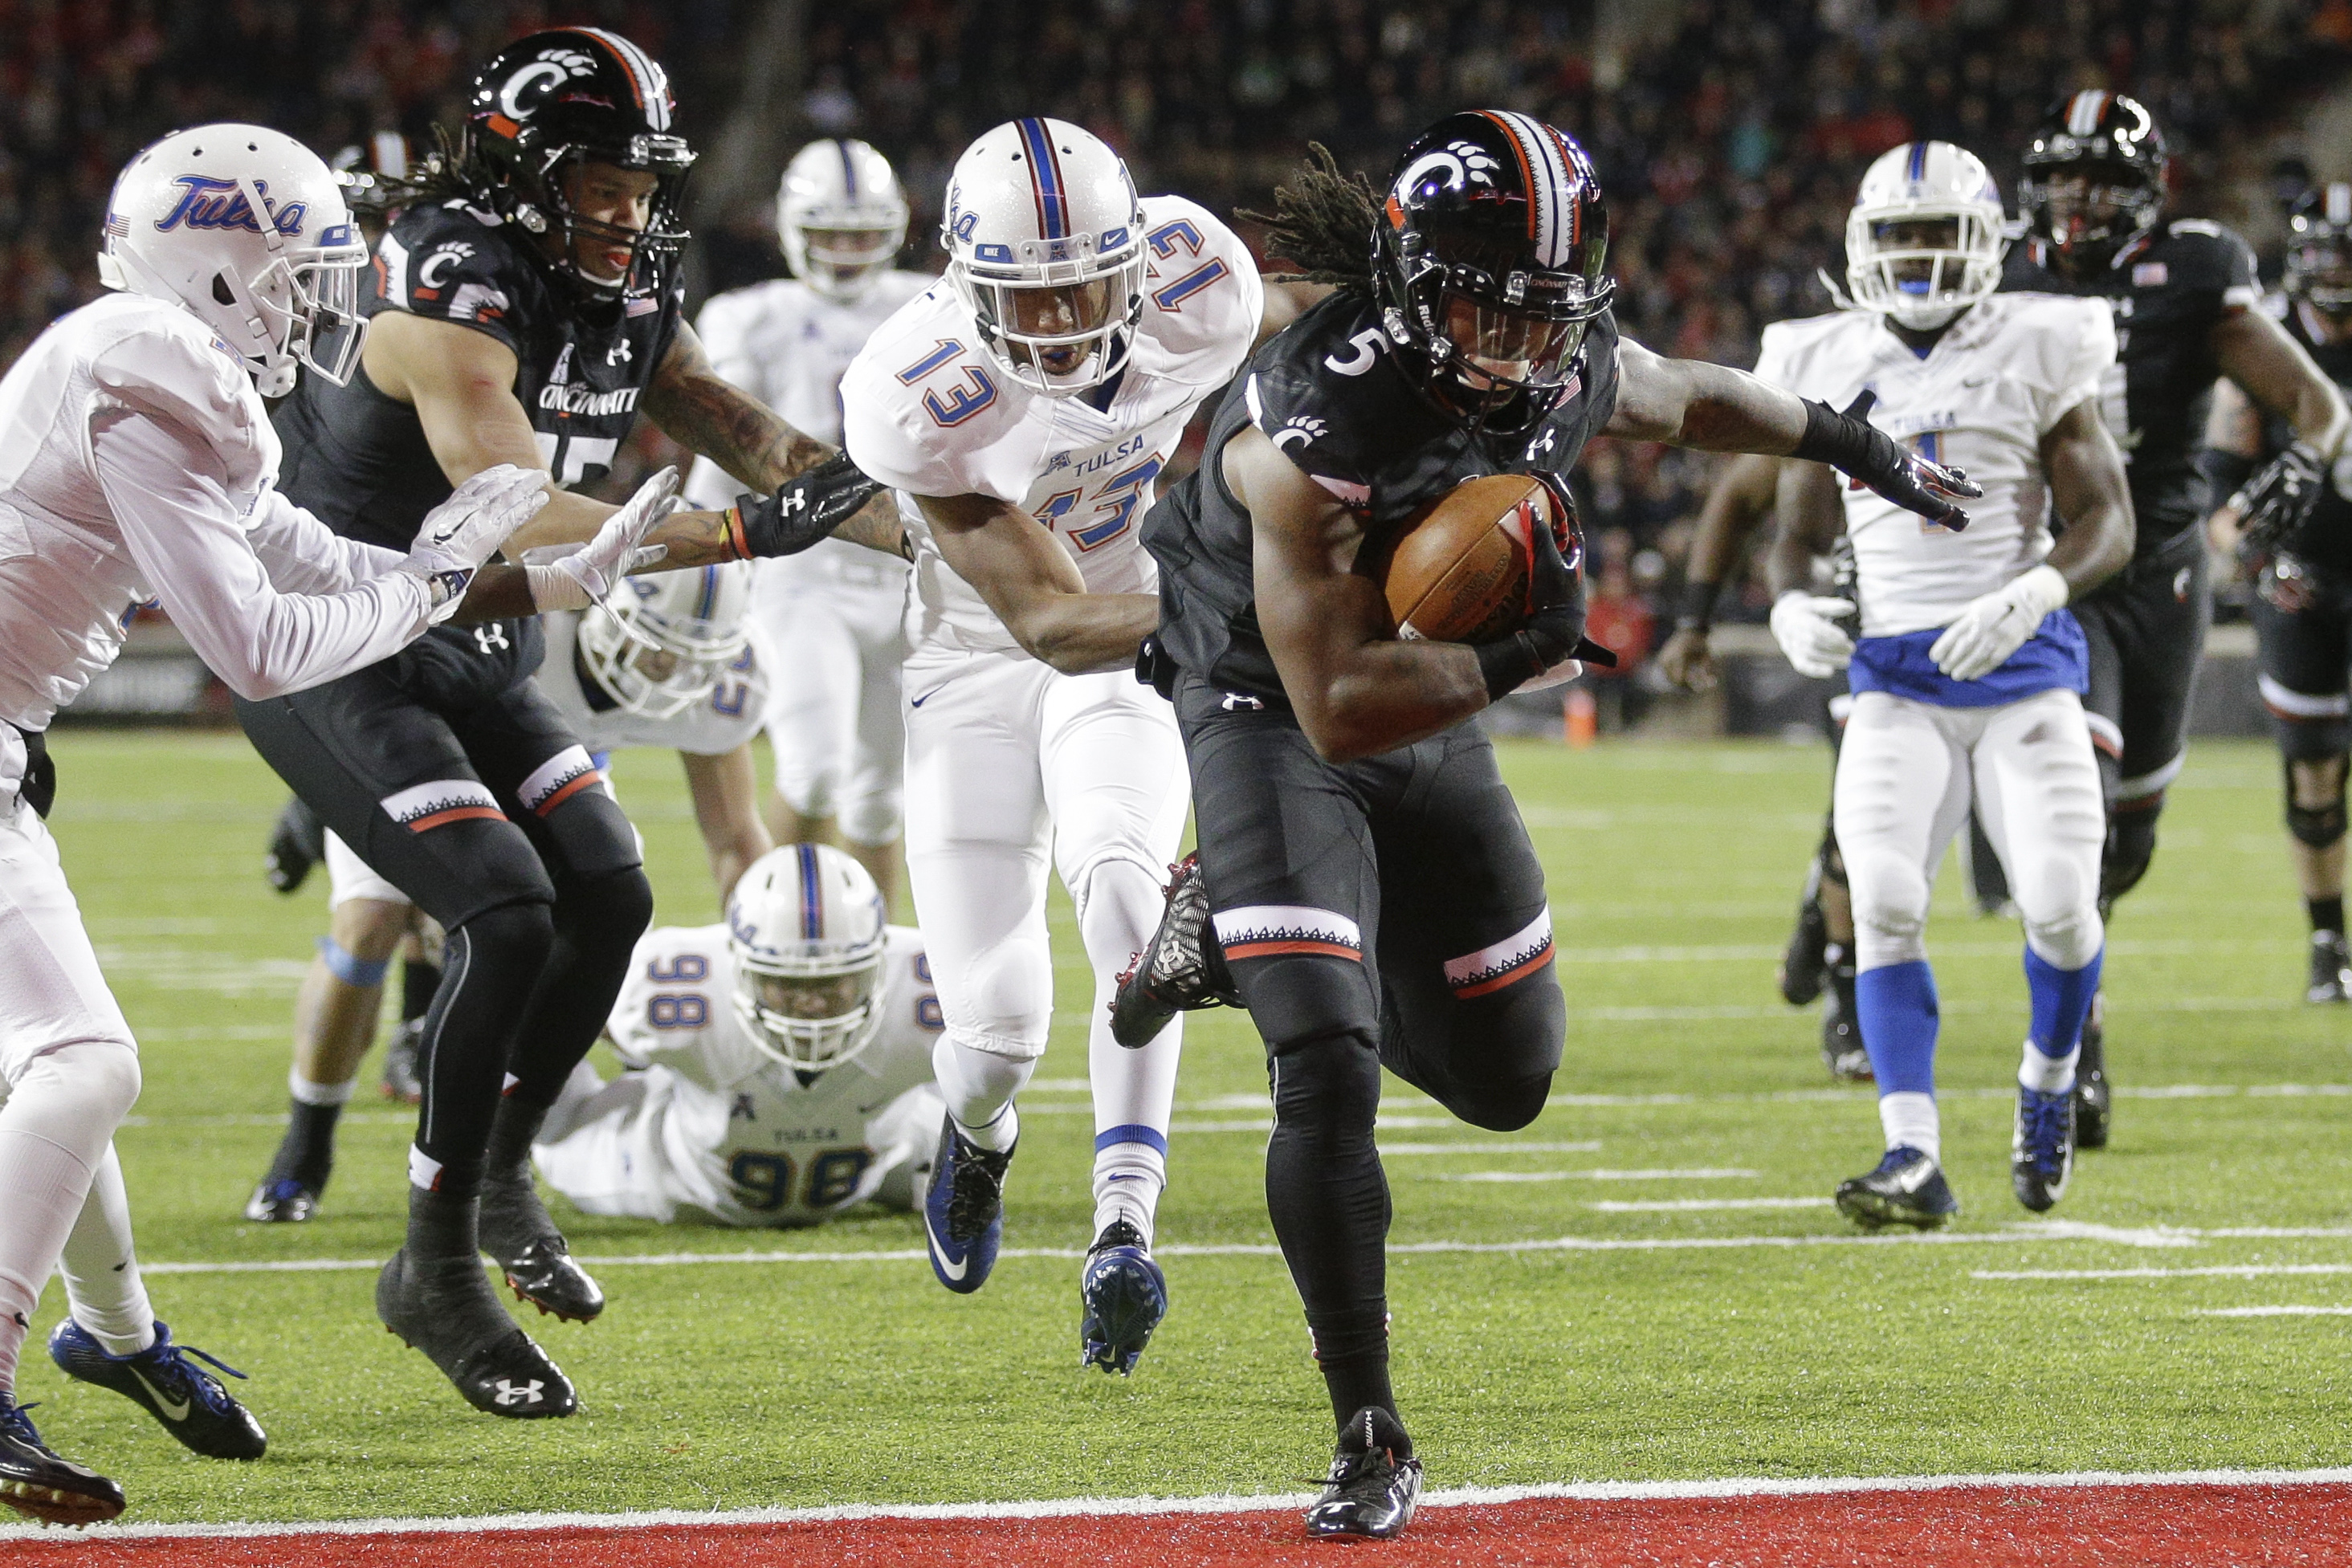 Cincinnati running back Mike Boone (5) scores a touchdown on a run against Tulsa safety Jordan Mitchell (13) the first half of an NCAA college football game, Saturday, Nov. 14, 2015, in Cincinnati. (AP Photo/John Minchillo)